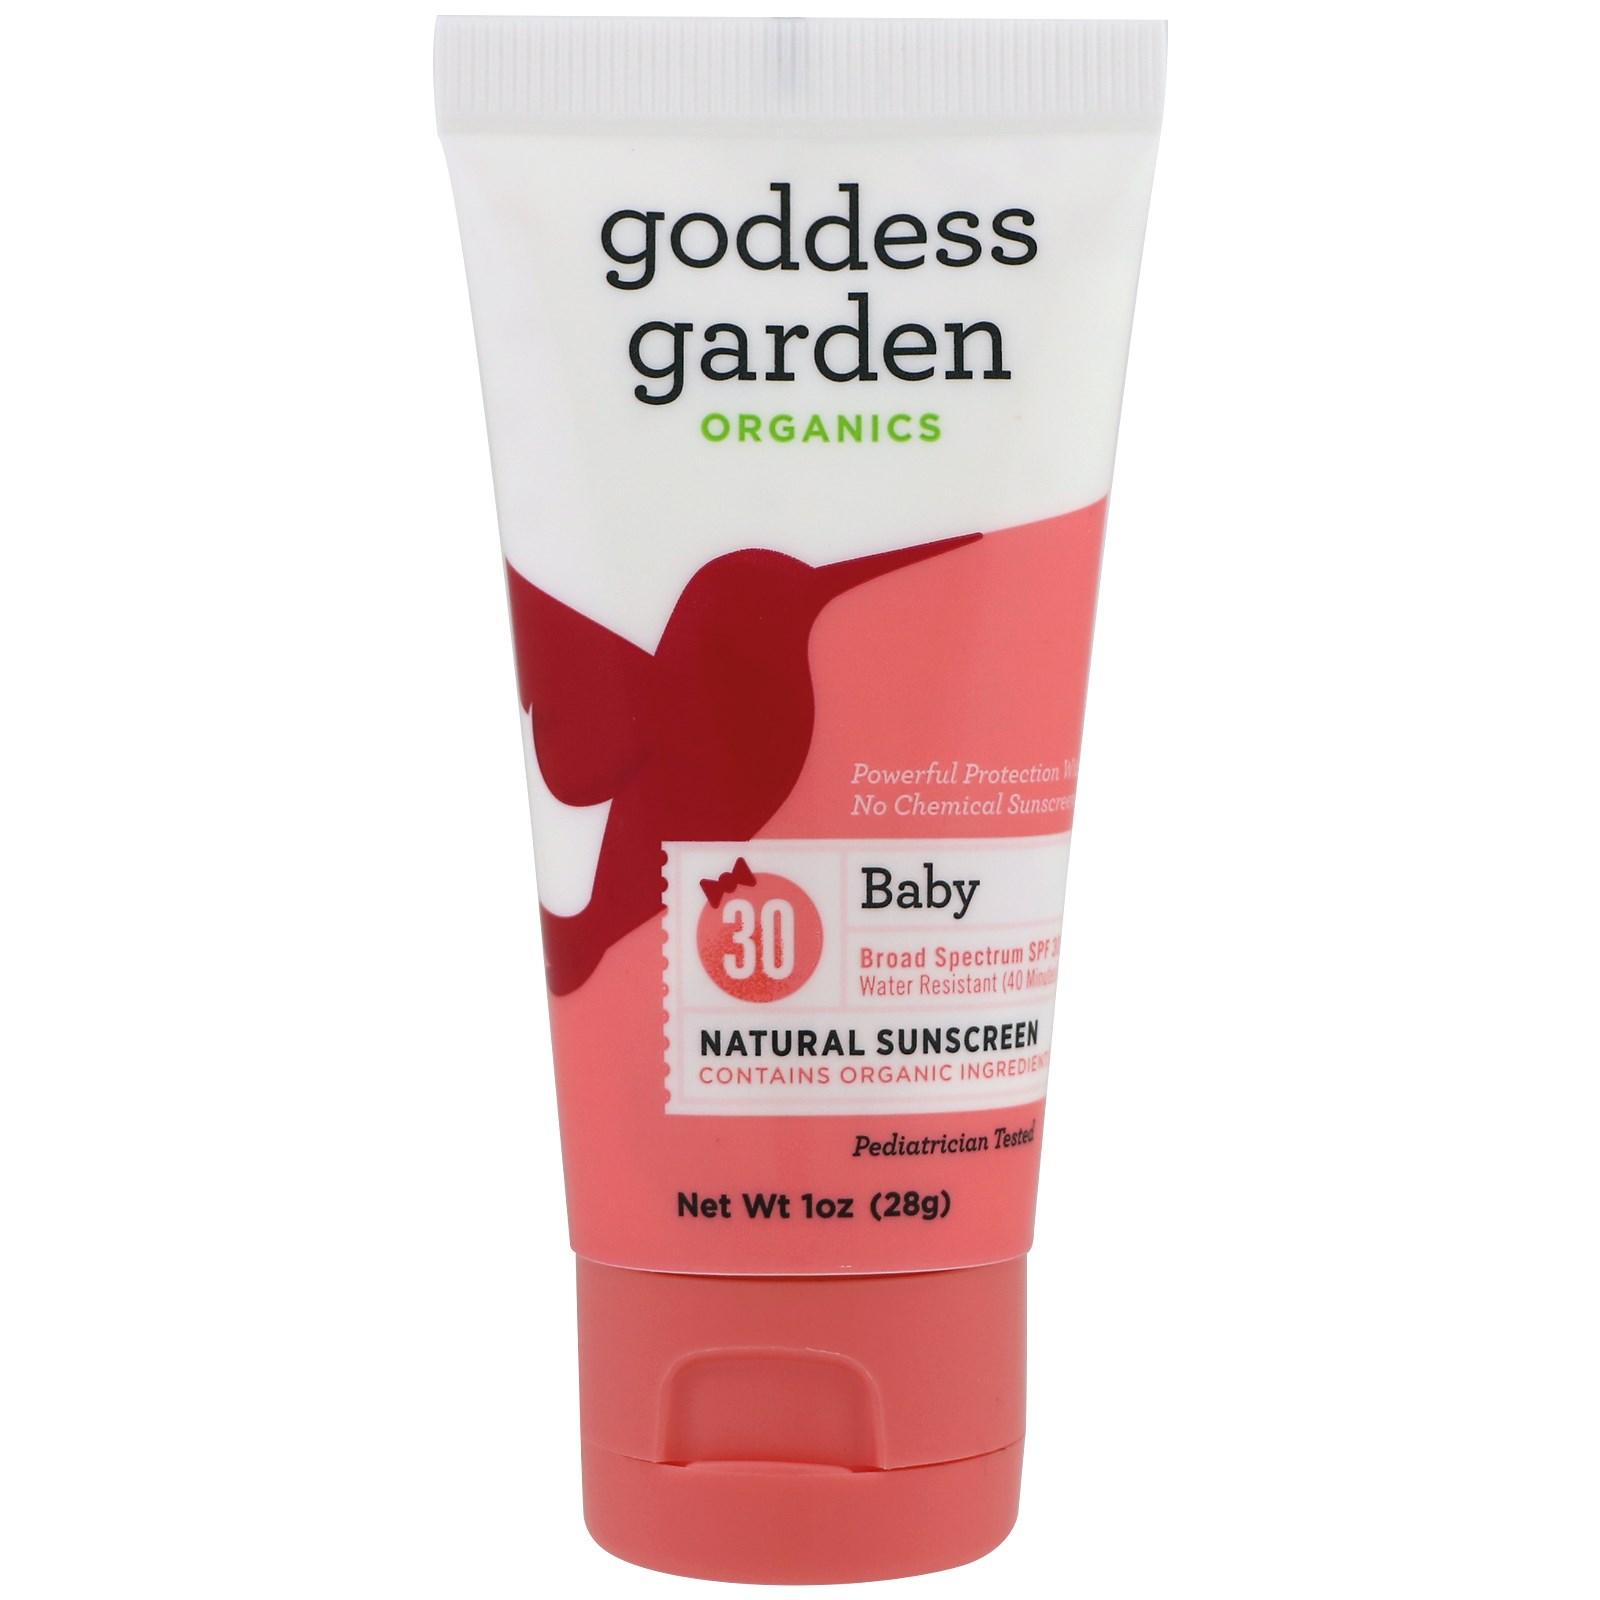 Goddess Garden, Organics, Natural Sunscreen, Baby, SPF 30, 1 oz (28 g)